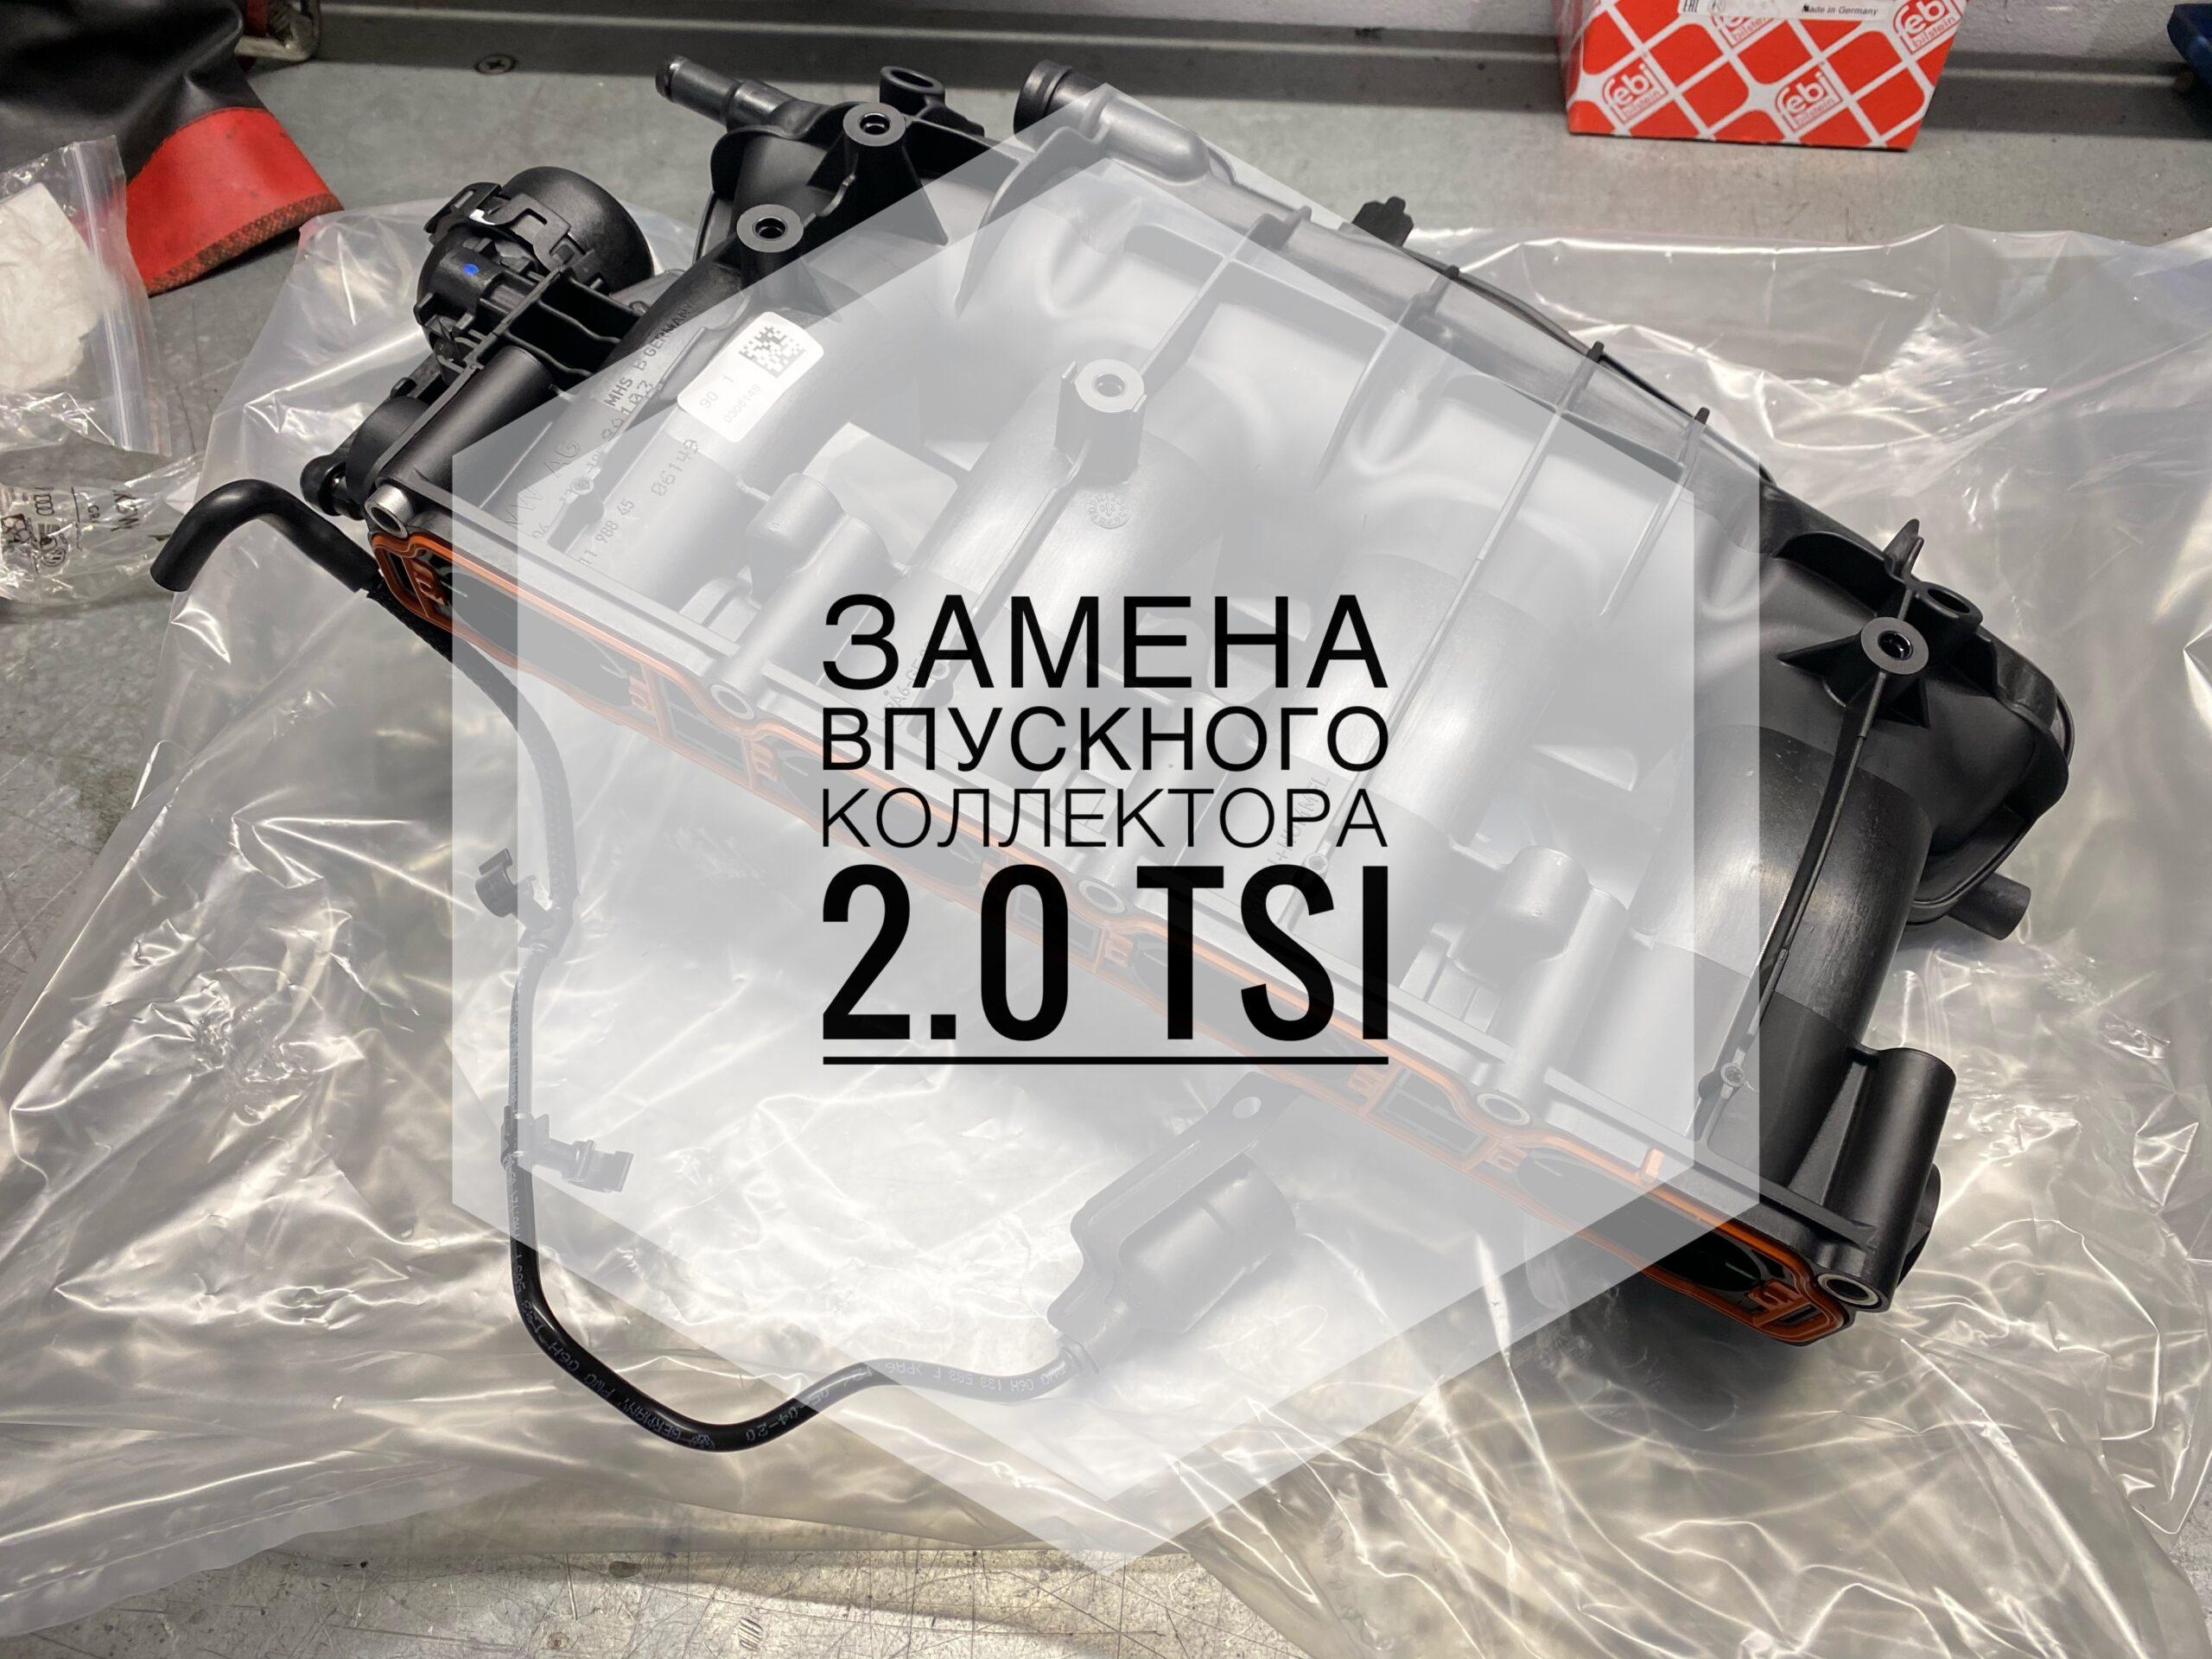 Замена выпускного коллектора Volkswagen Tiguan 2.0 TSI (CAWA), ремонт неисправности заслонок